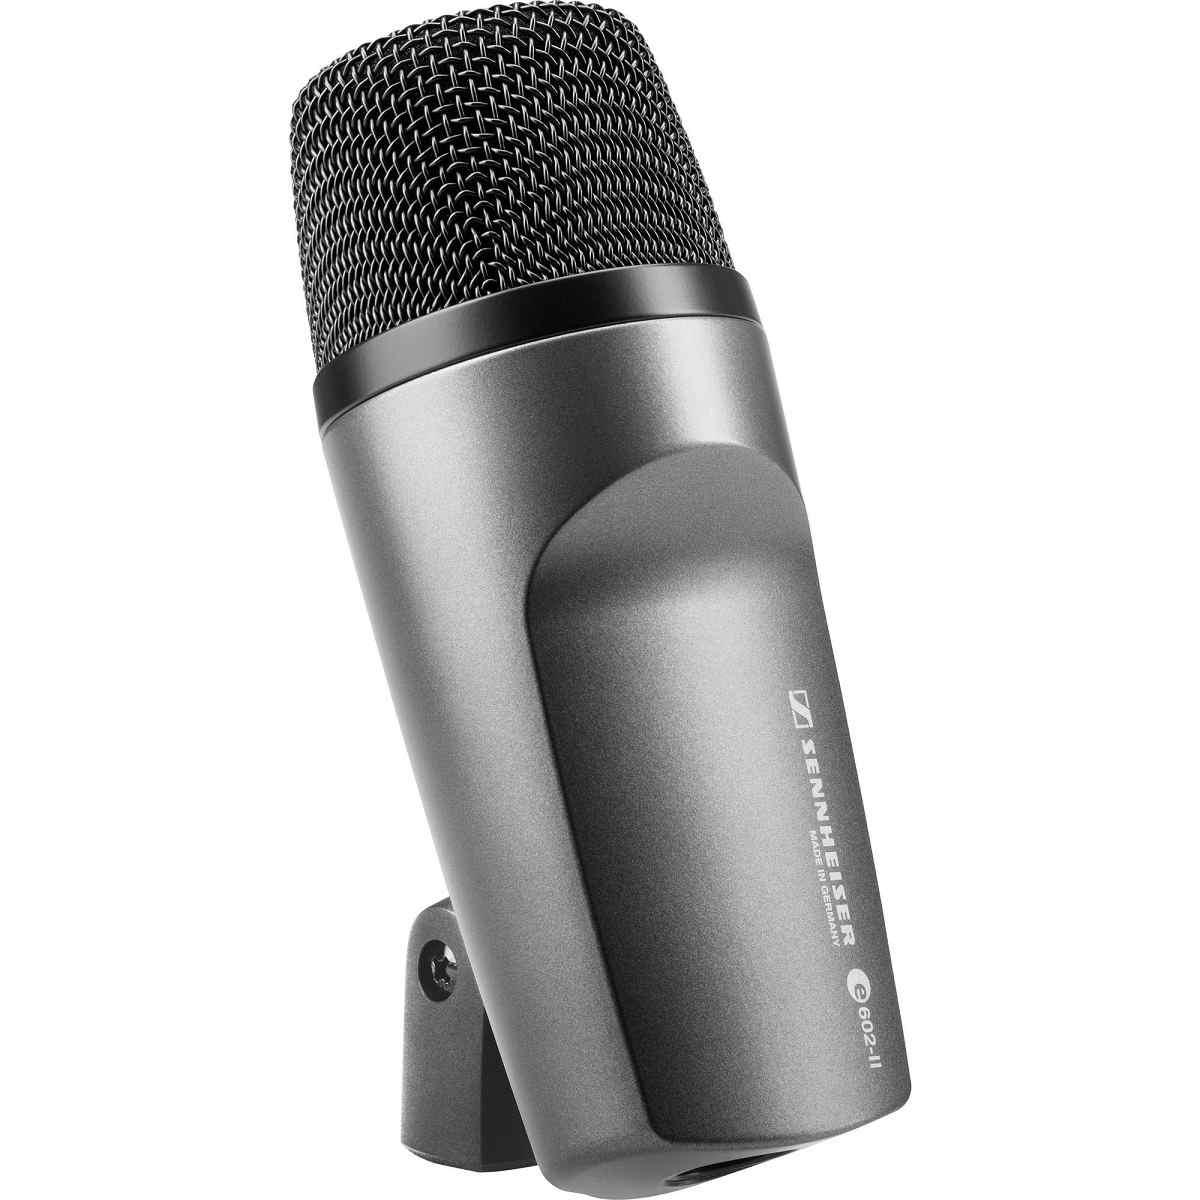 Microfone Cardióde E602 II Sennheiser P/ Instrumentos